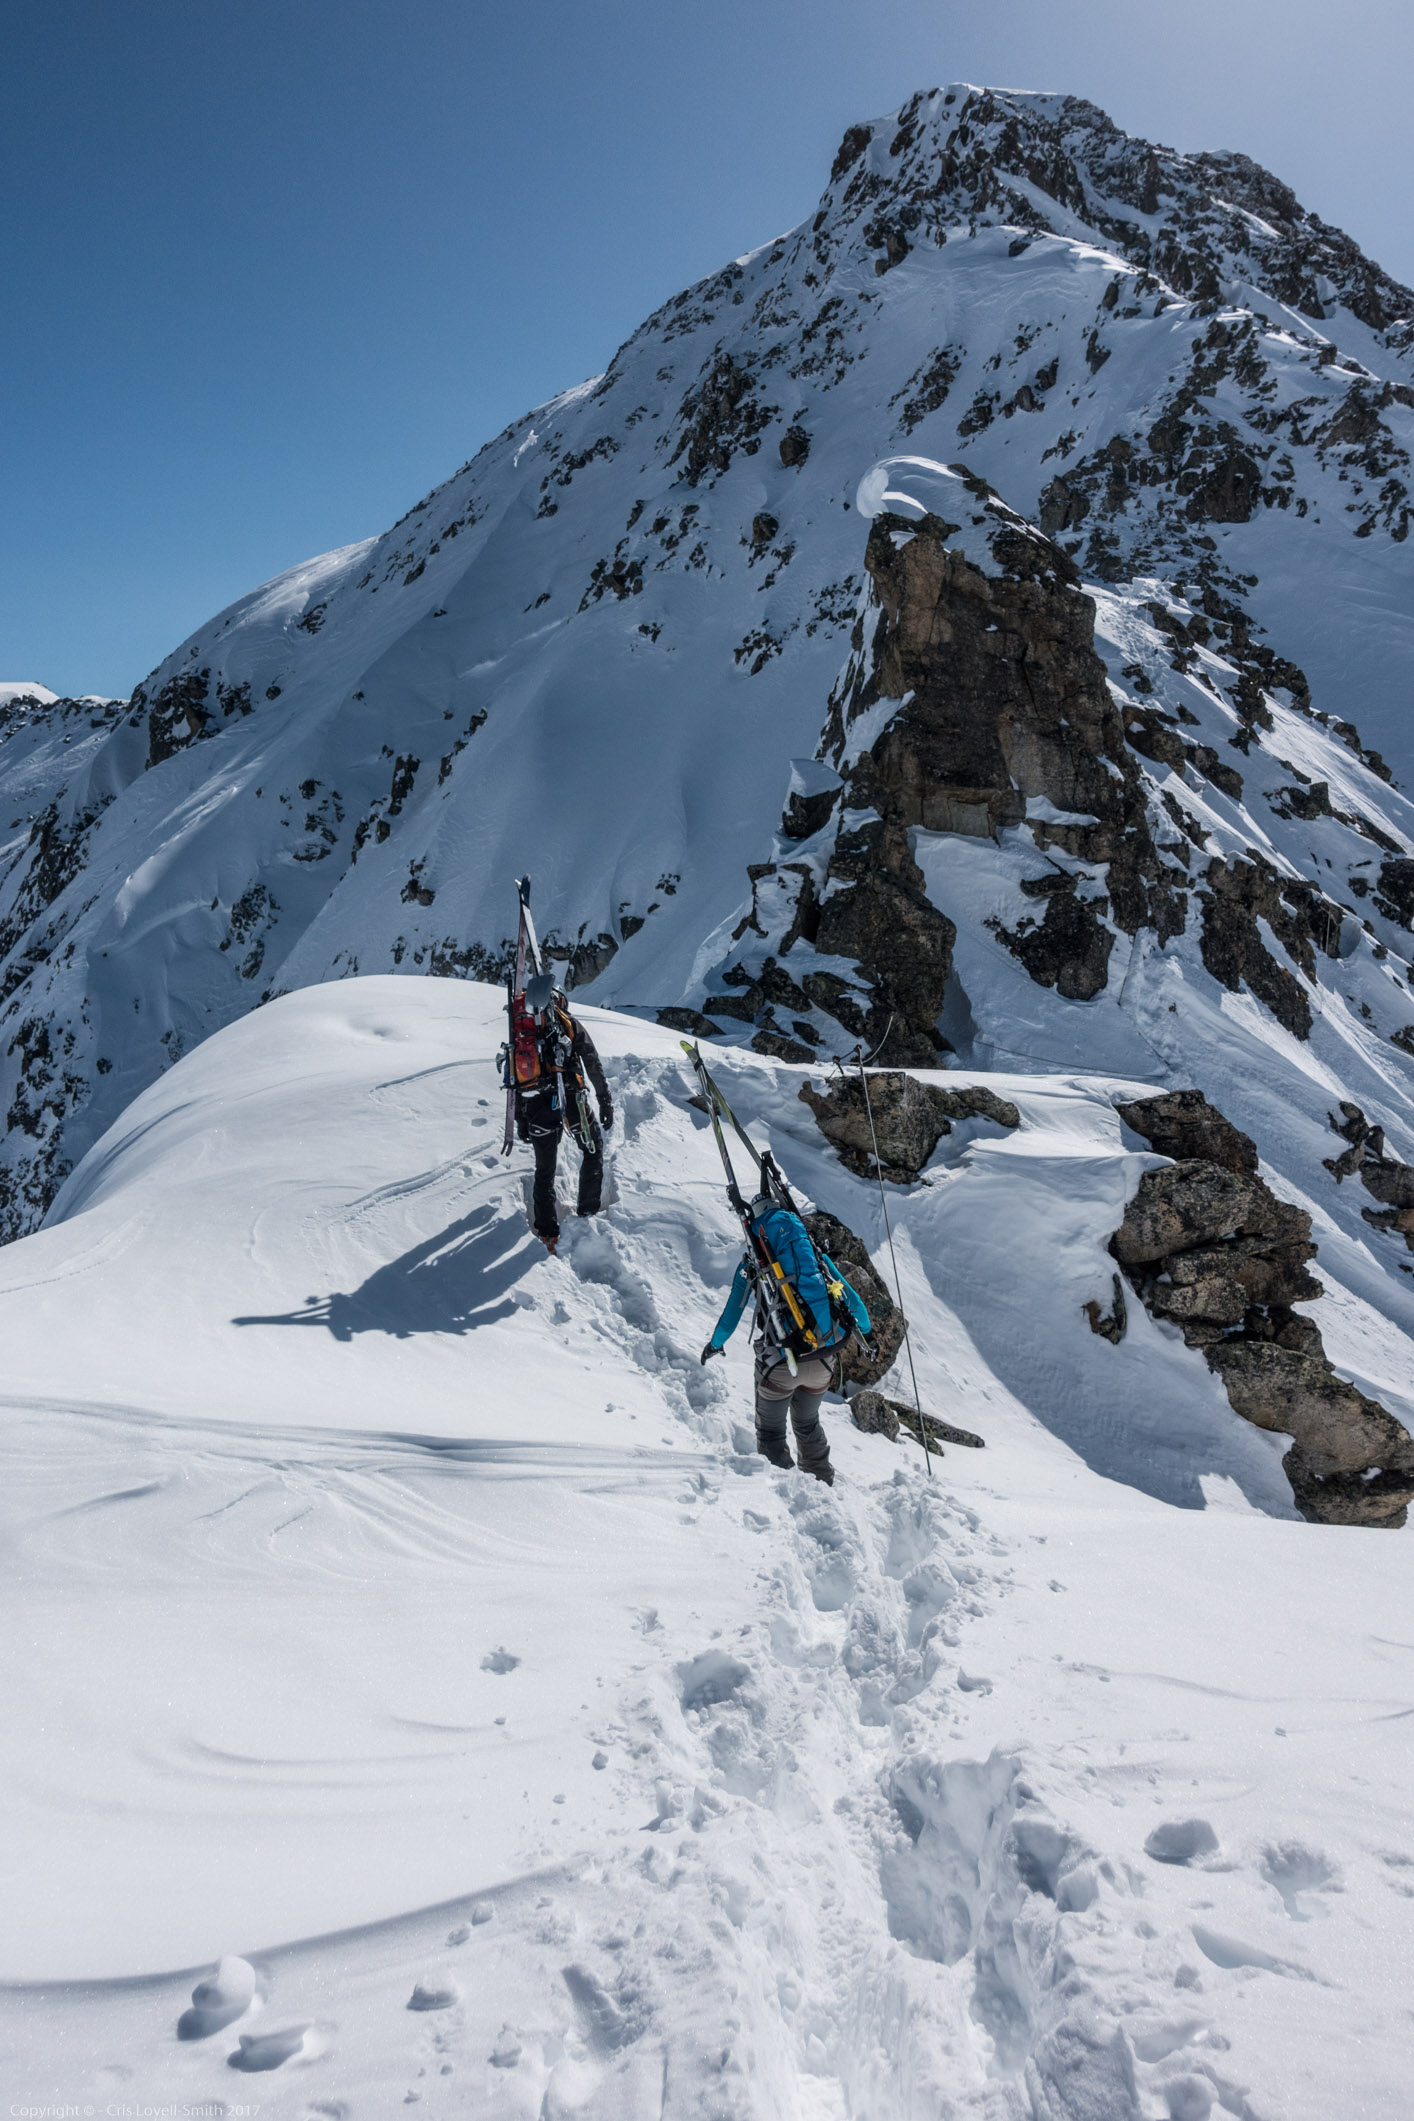 Walking along the ridge (Arlberg Winterklettersteig March 2017)